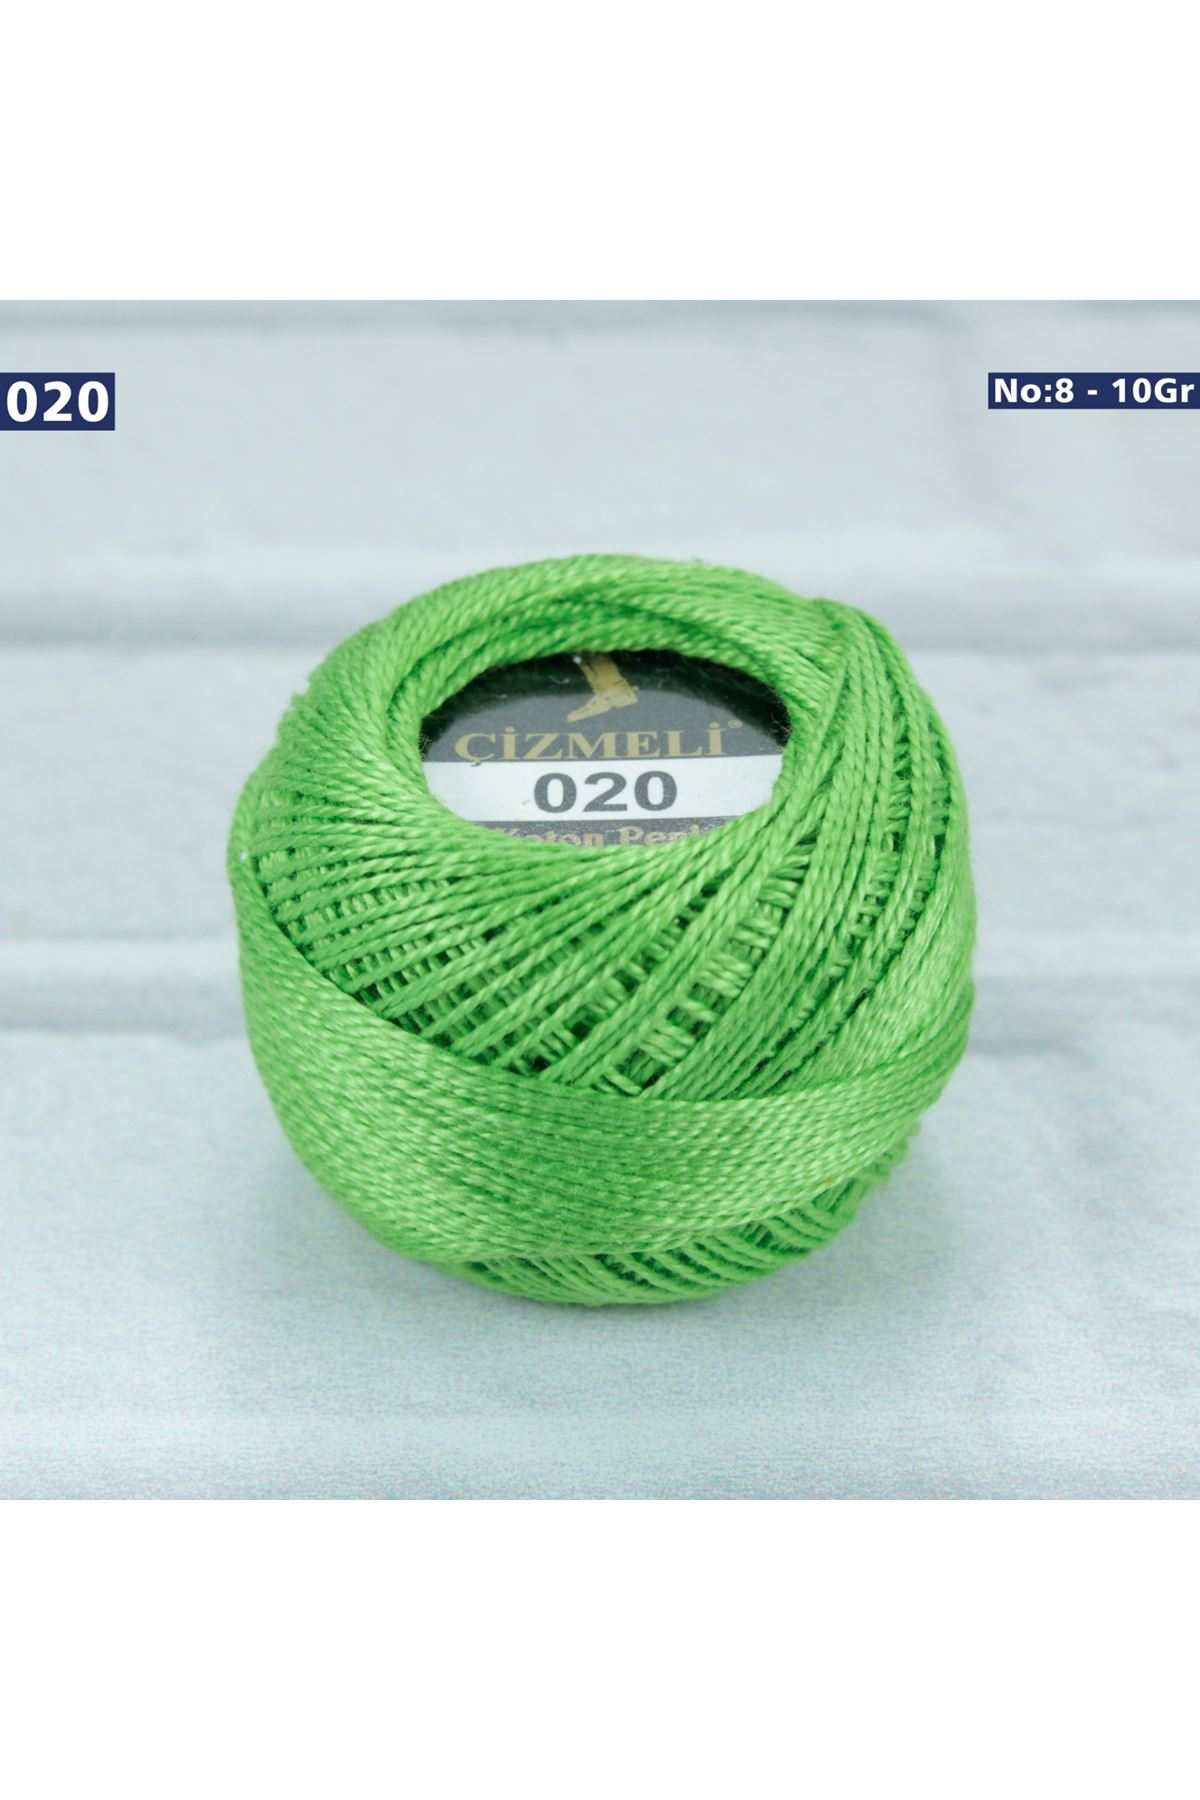 Çizmeli Cotton Perle Nakış İpliği No: 020